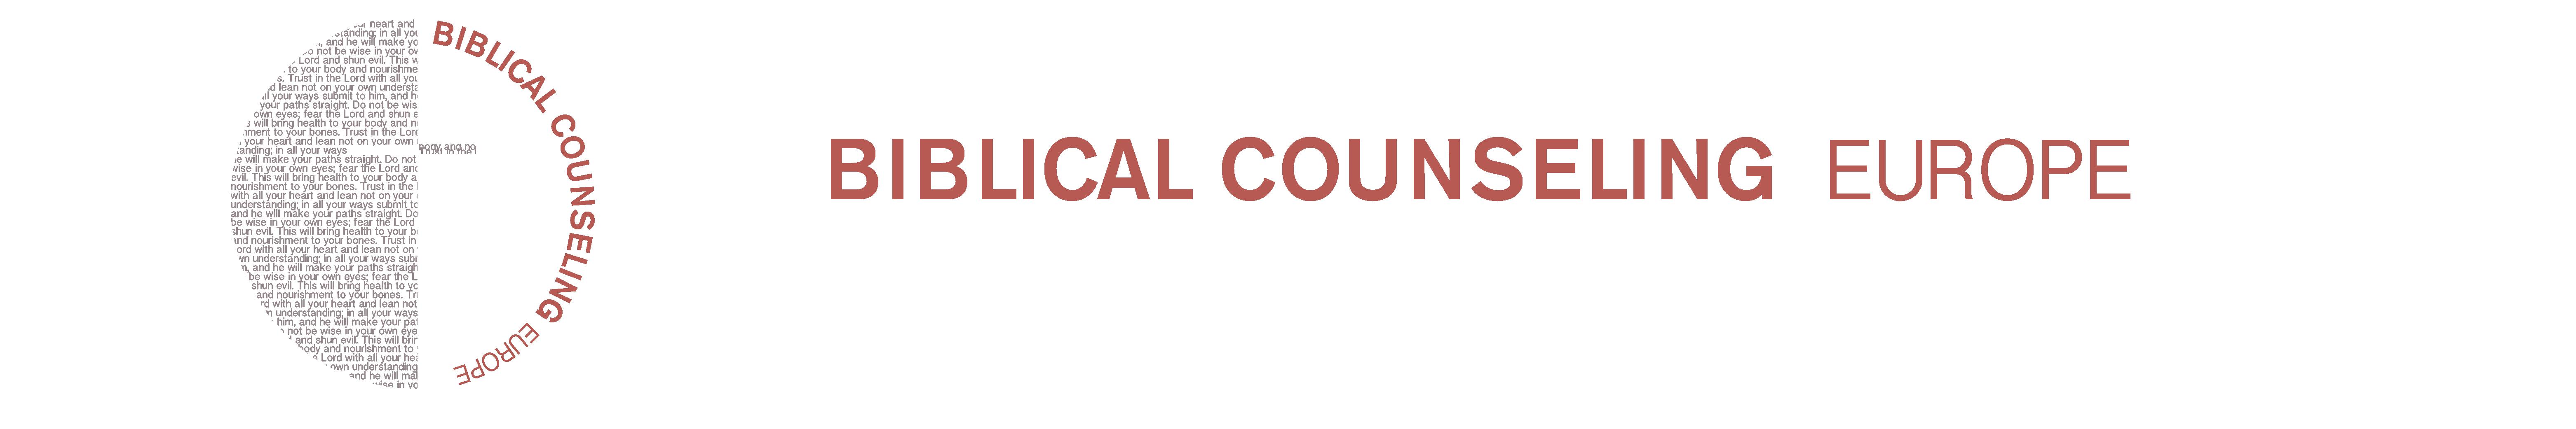 Biblical Counseling Europe